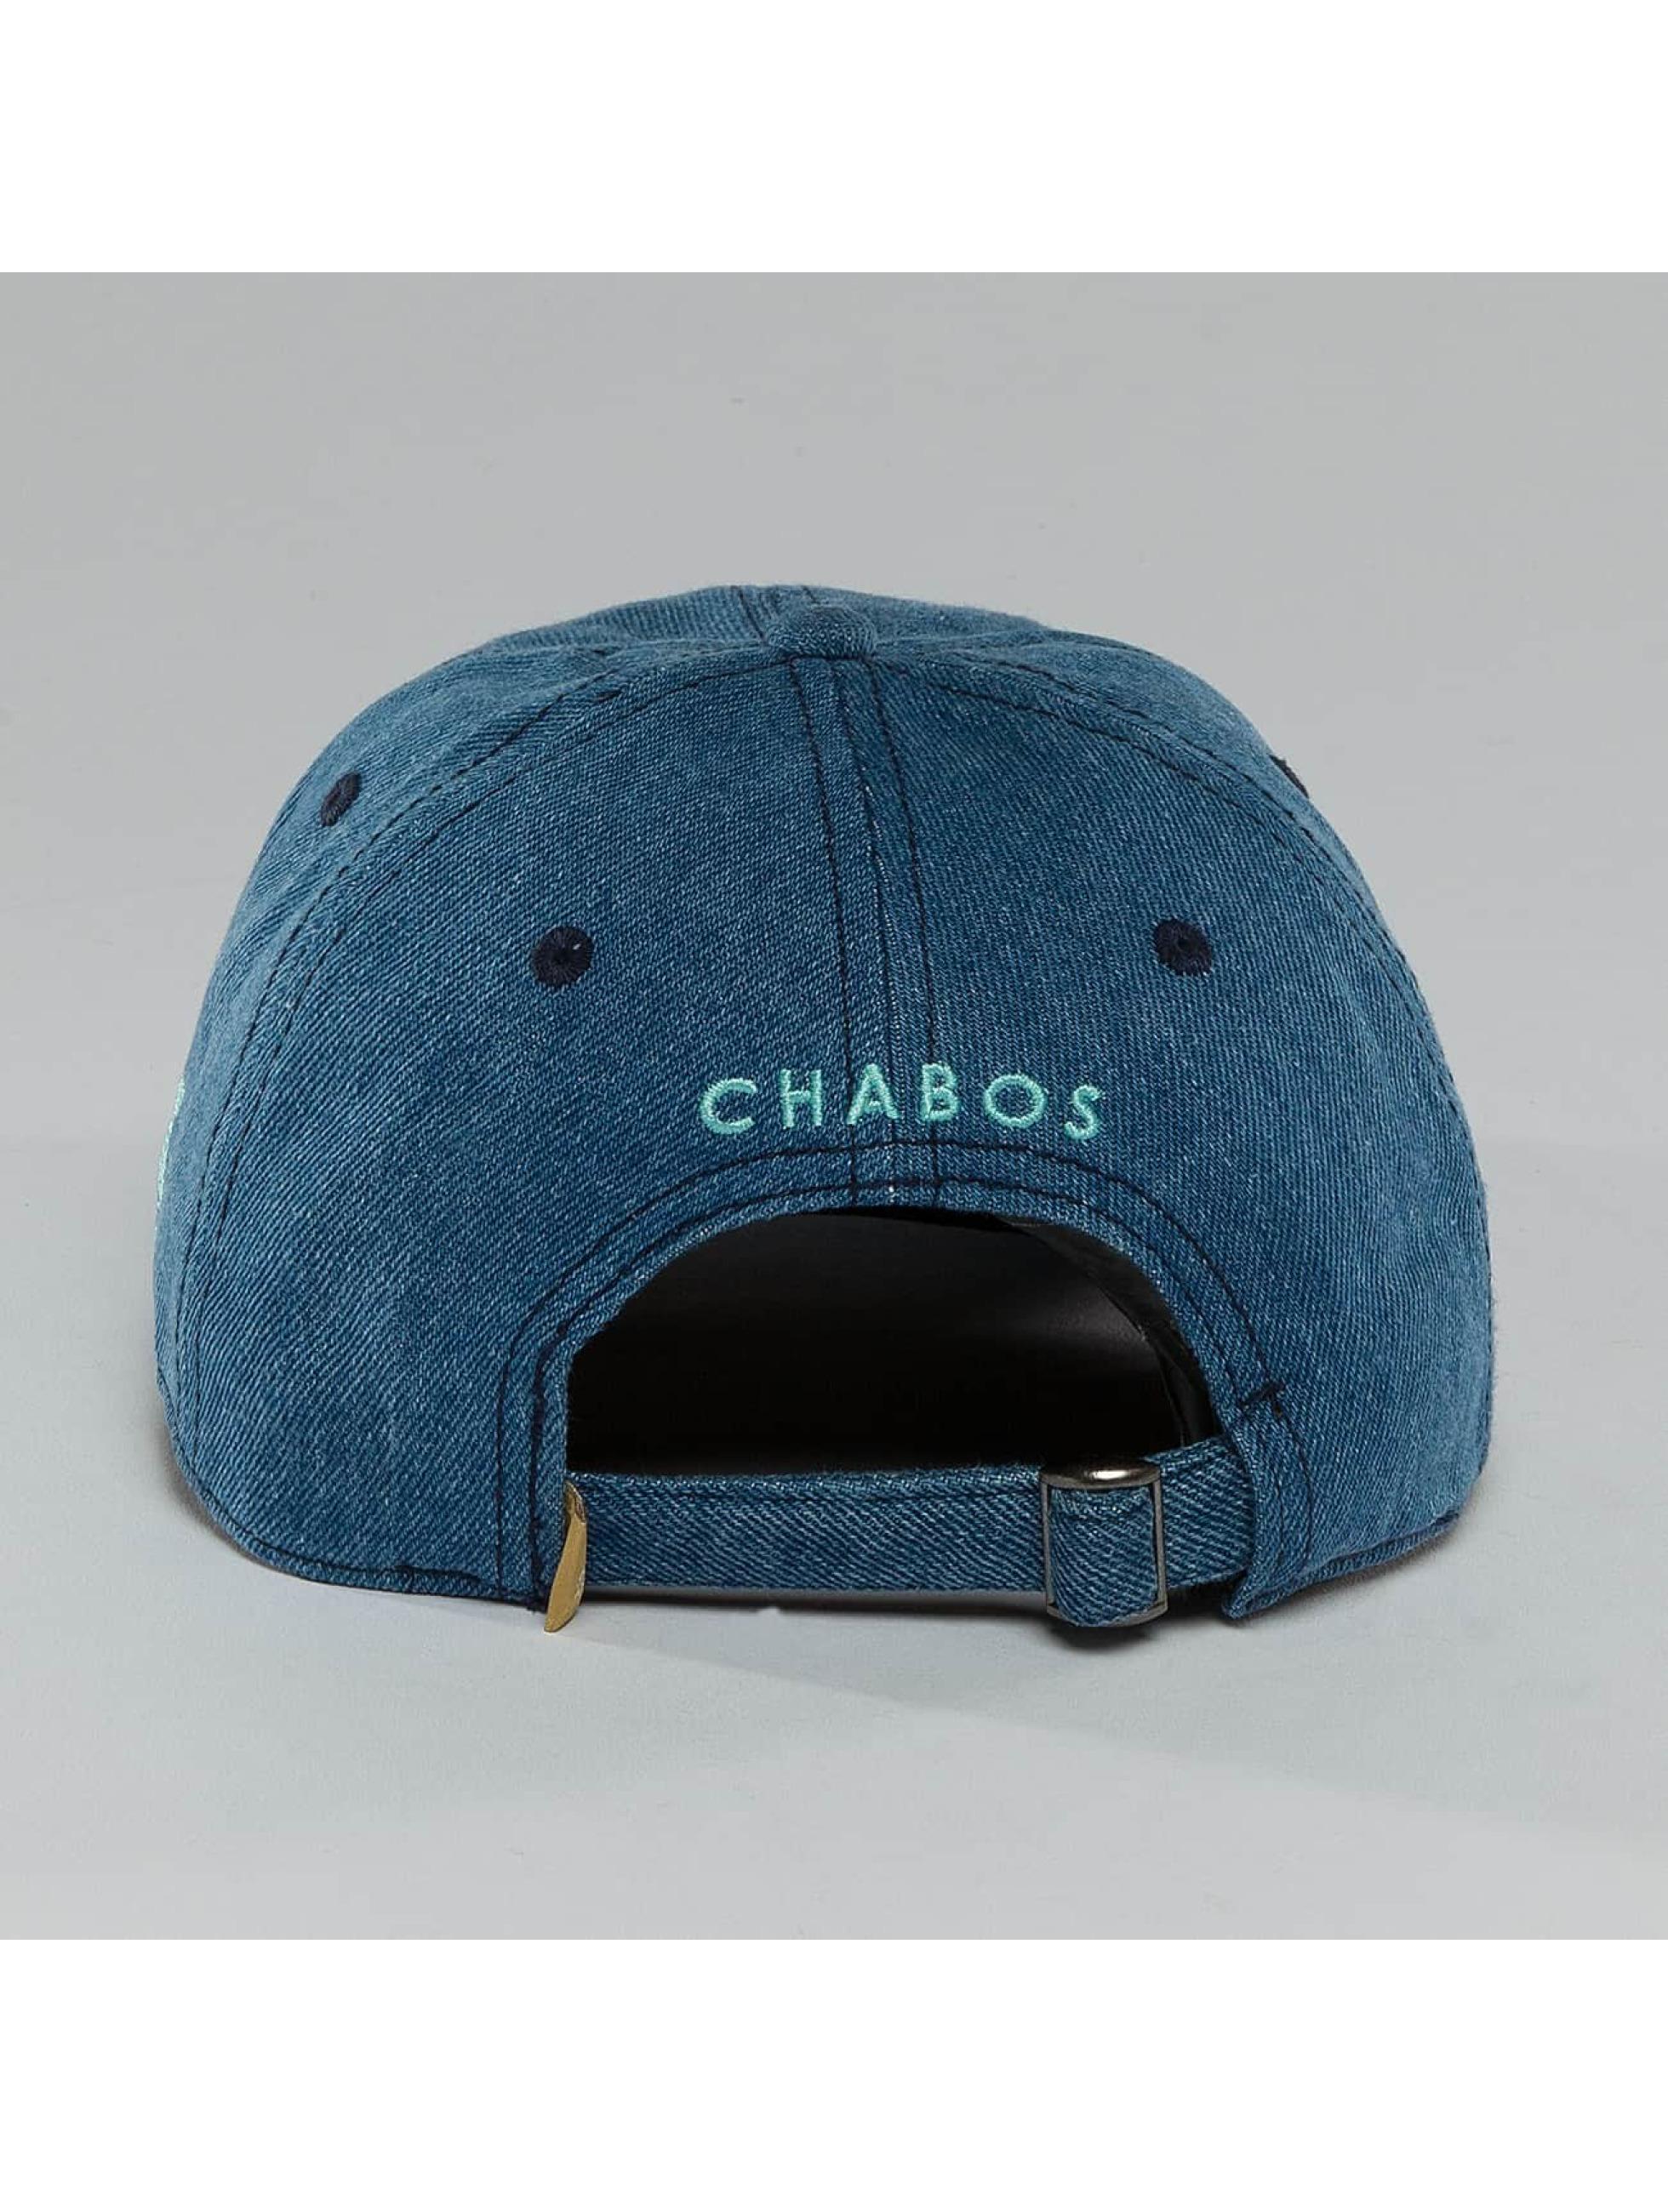 CHABOS IIVII snapback cap Pyramid blauw